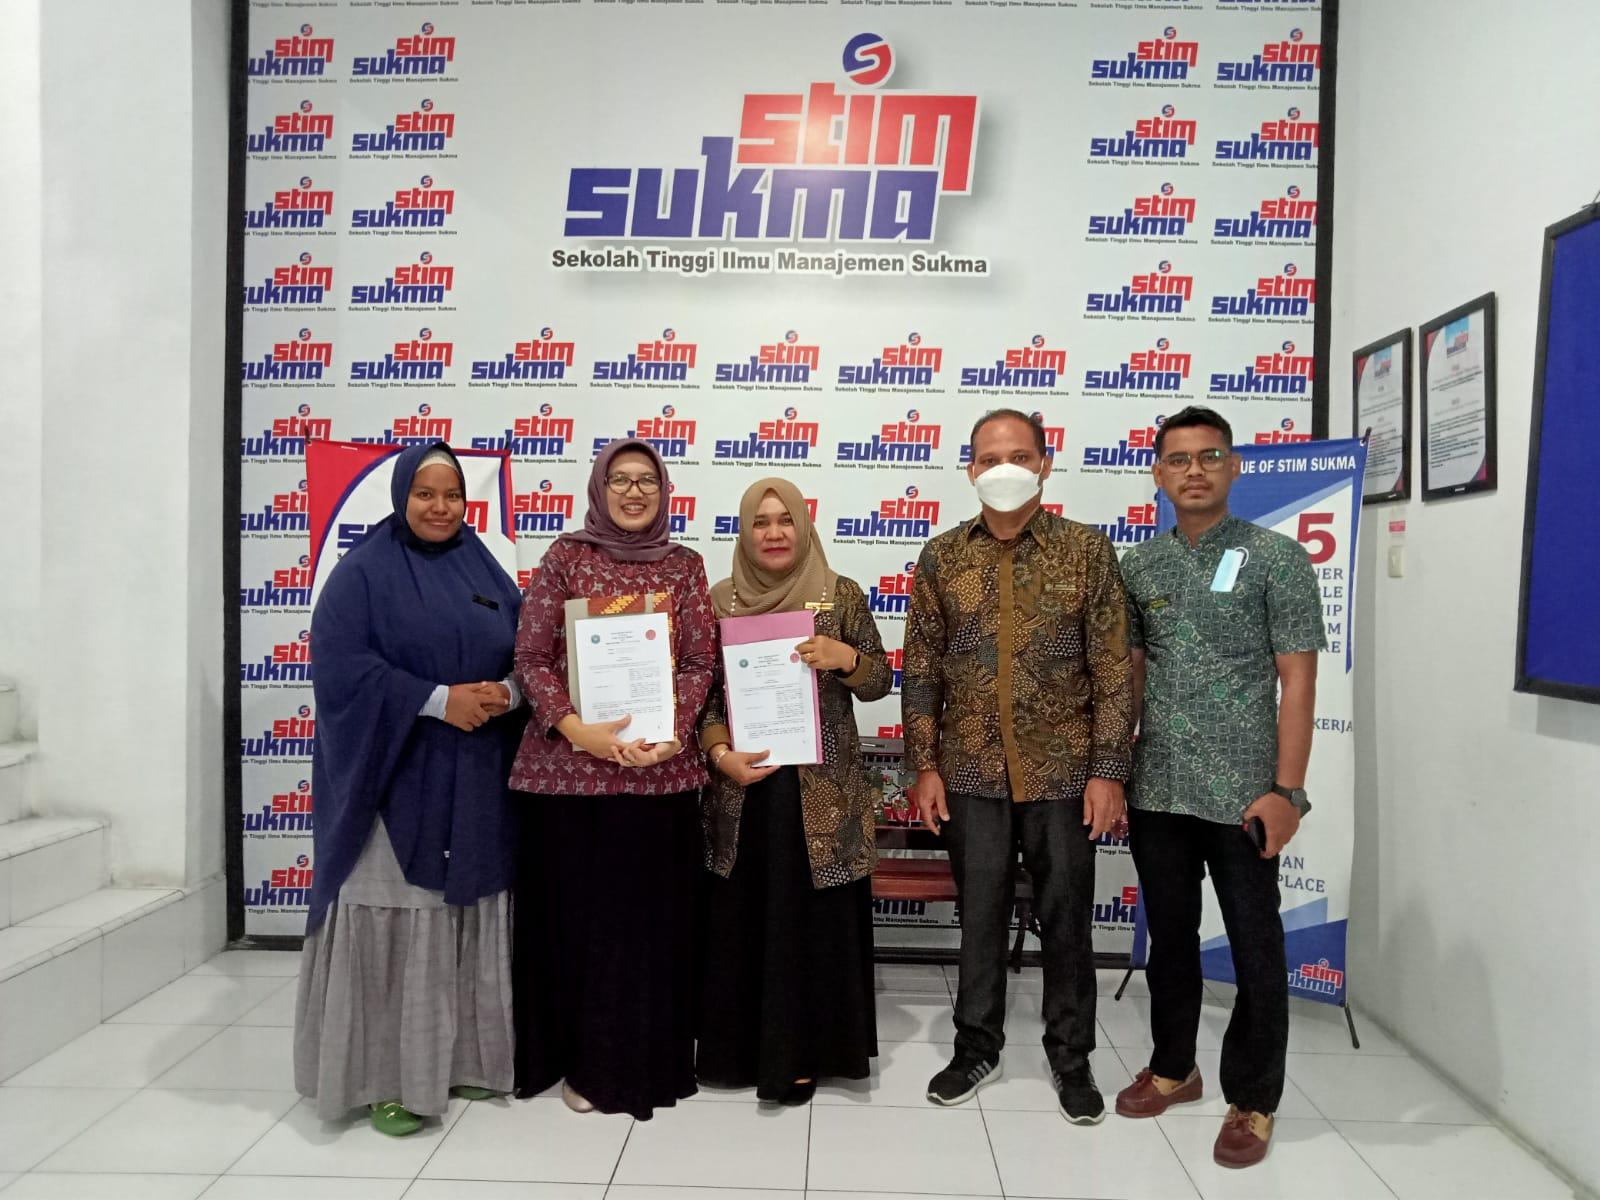 Muo SMK Gelora Jaya Nusantara Medan dengan STIM Sukma Medan